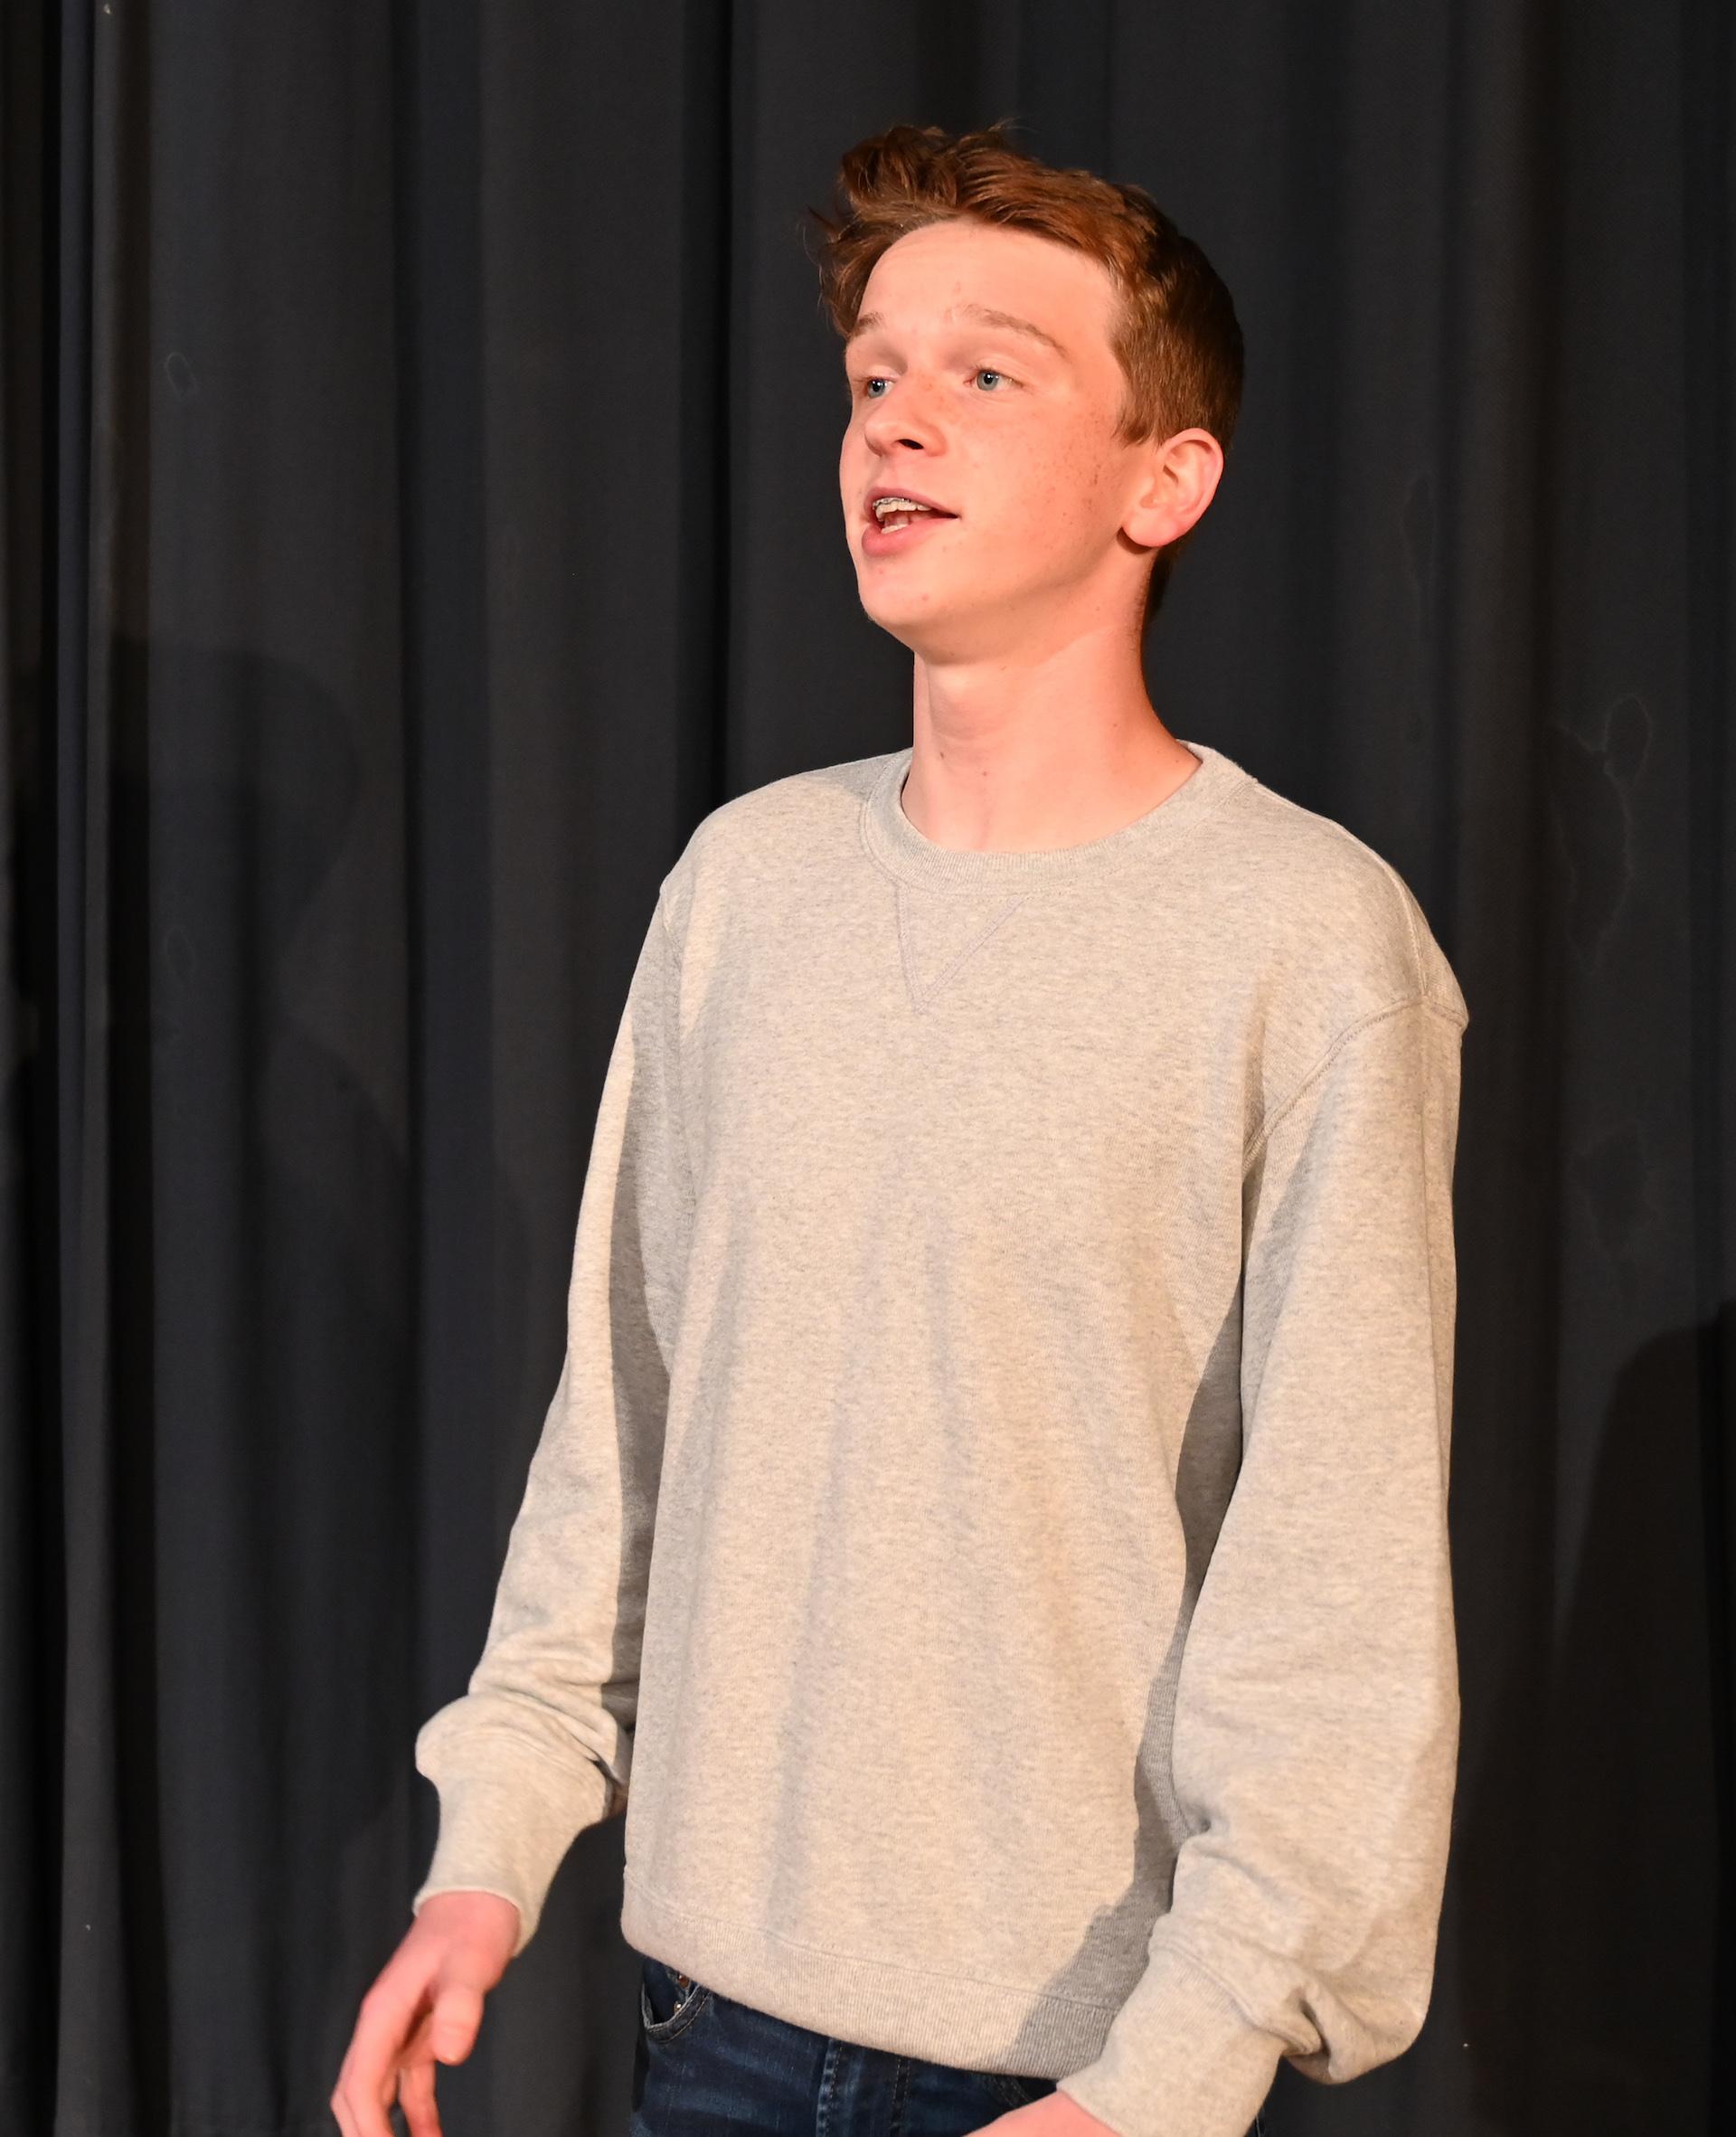 CCHS sophomore Haglund receives national recognition for vocal talent